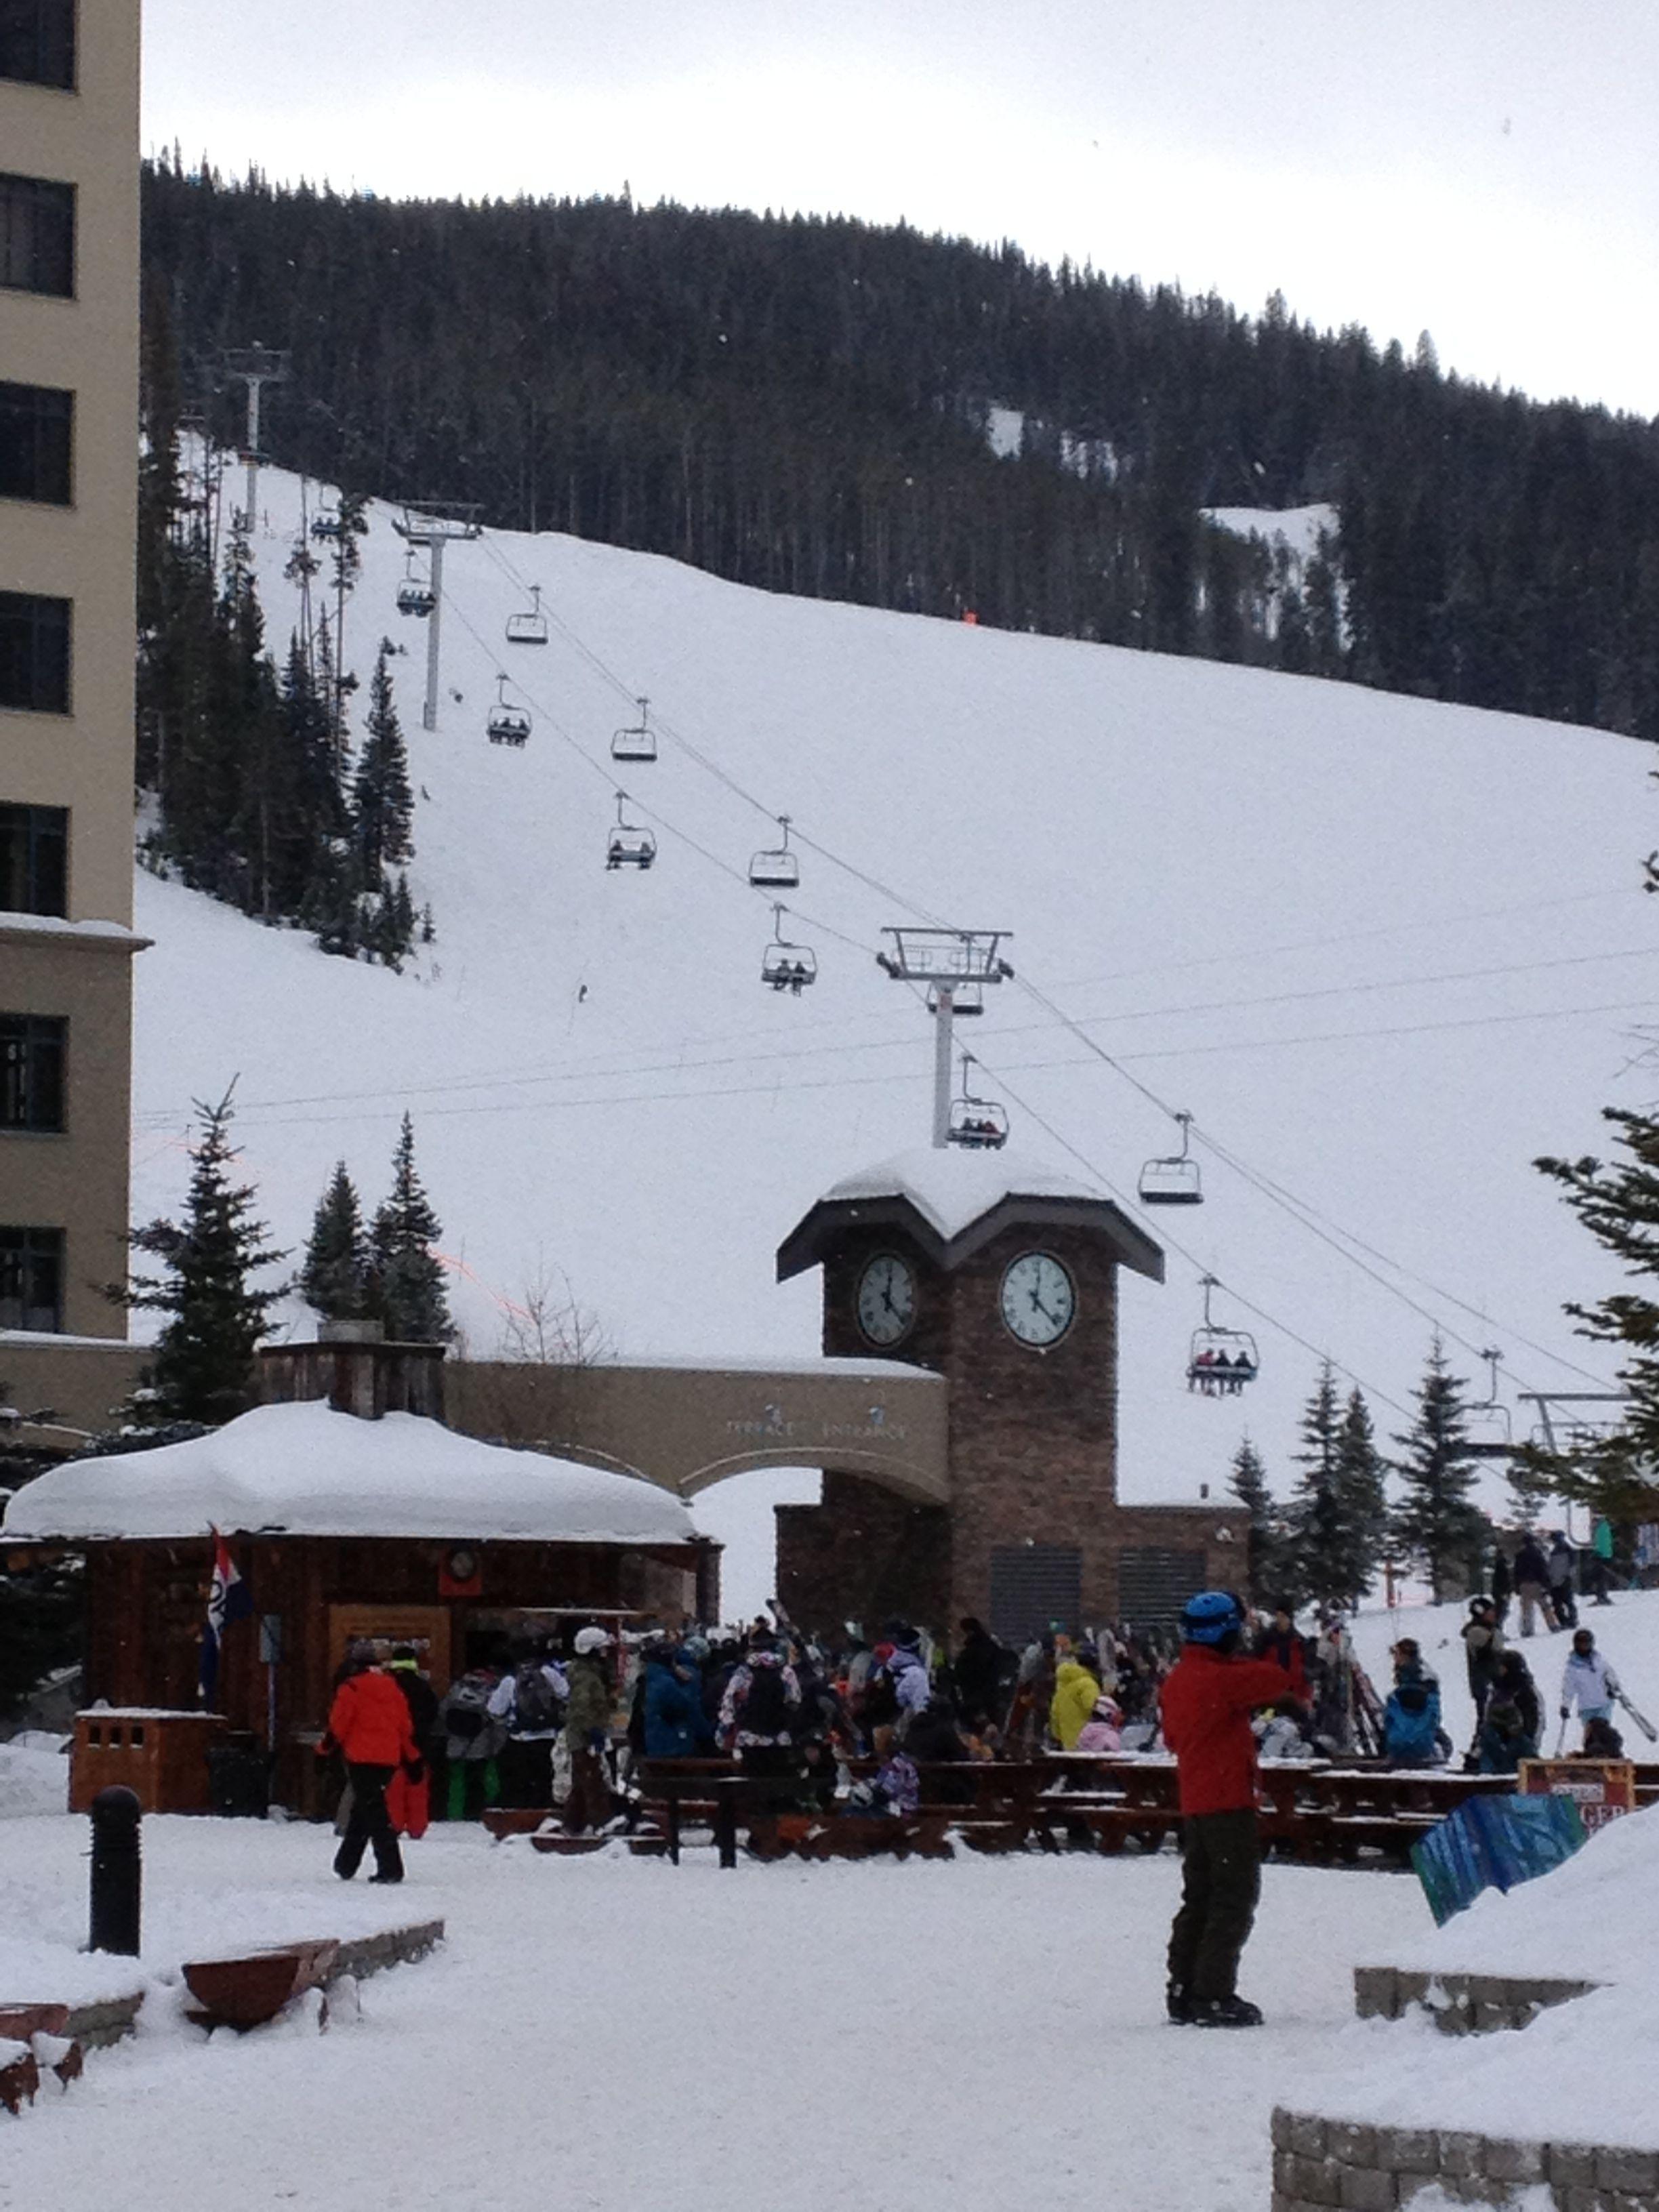 BS, MT Ski destination, Skiing, Outdoor